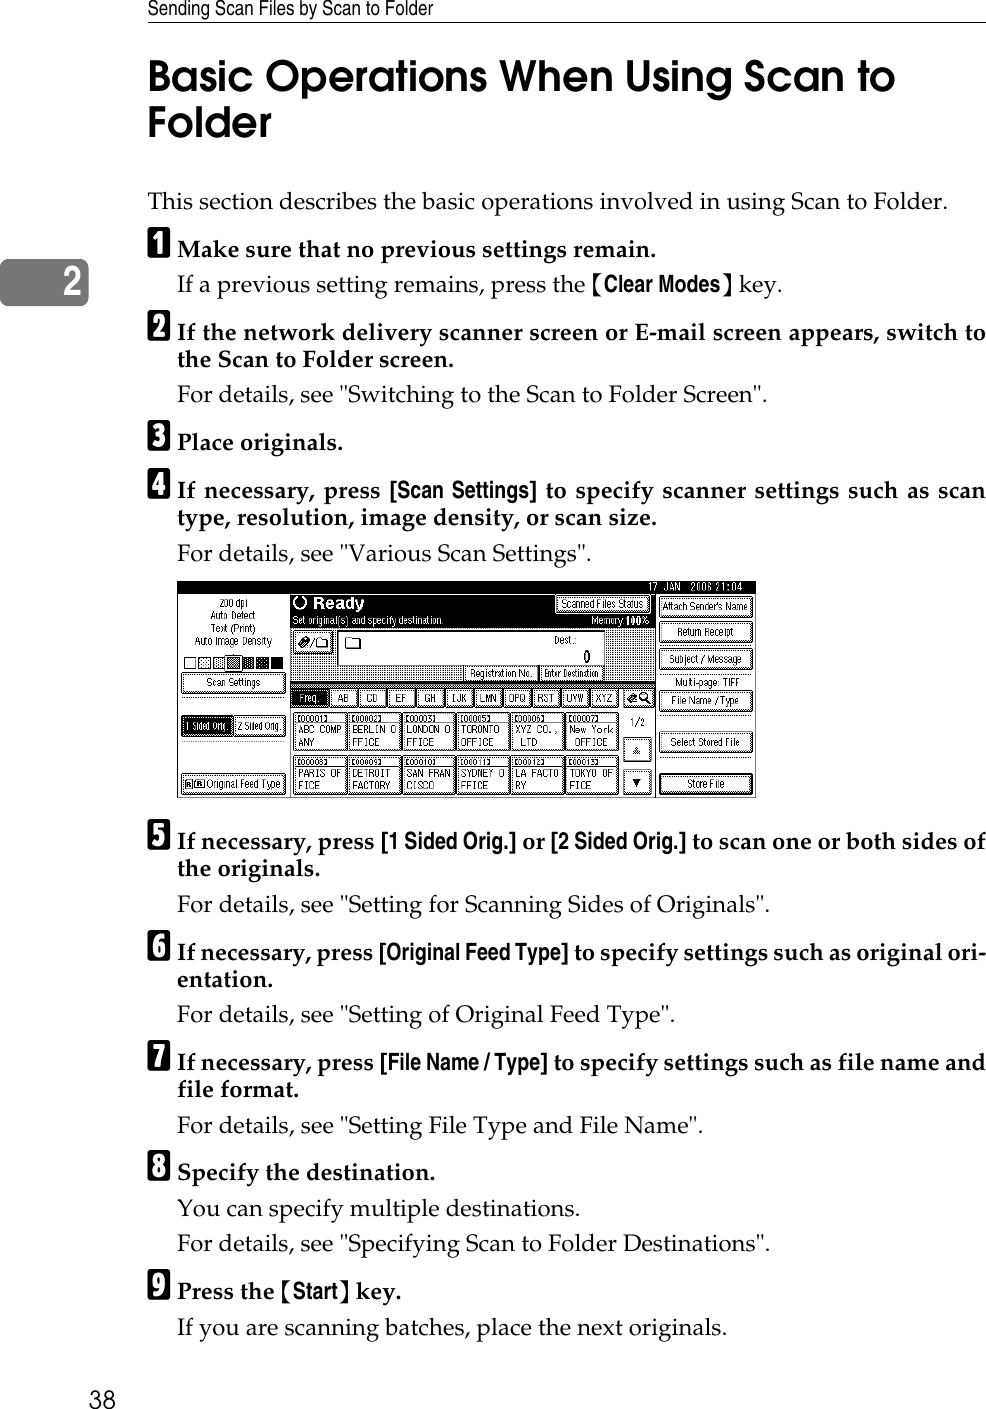 Ricoh Mp 2590 Users Manual